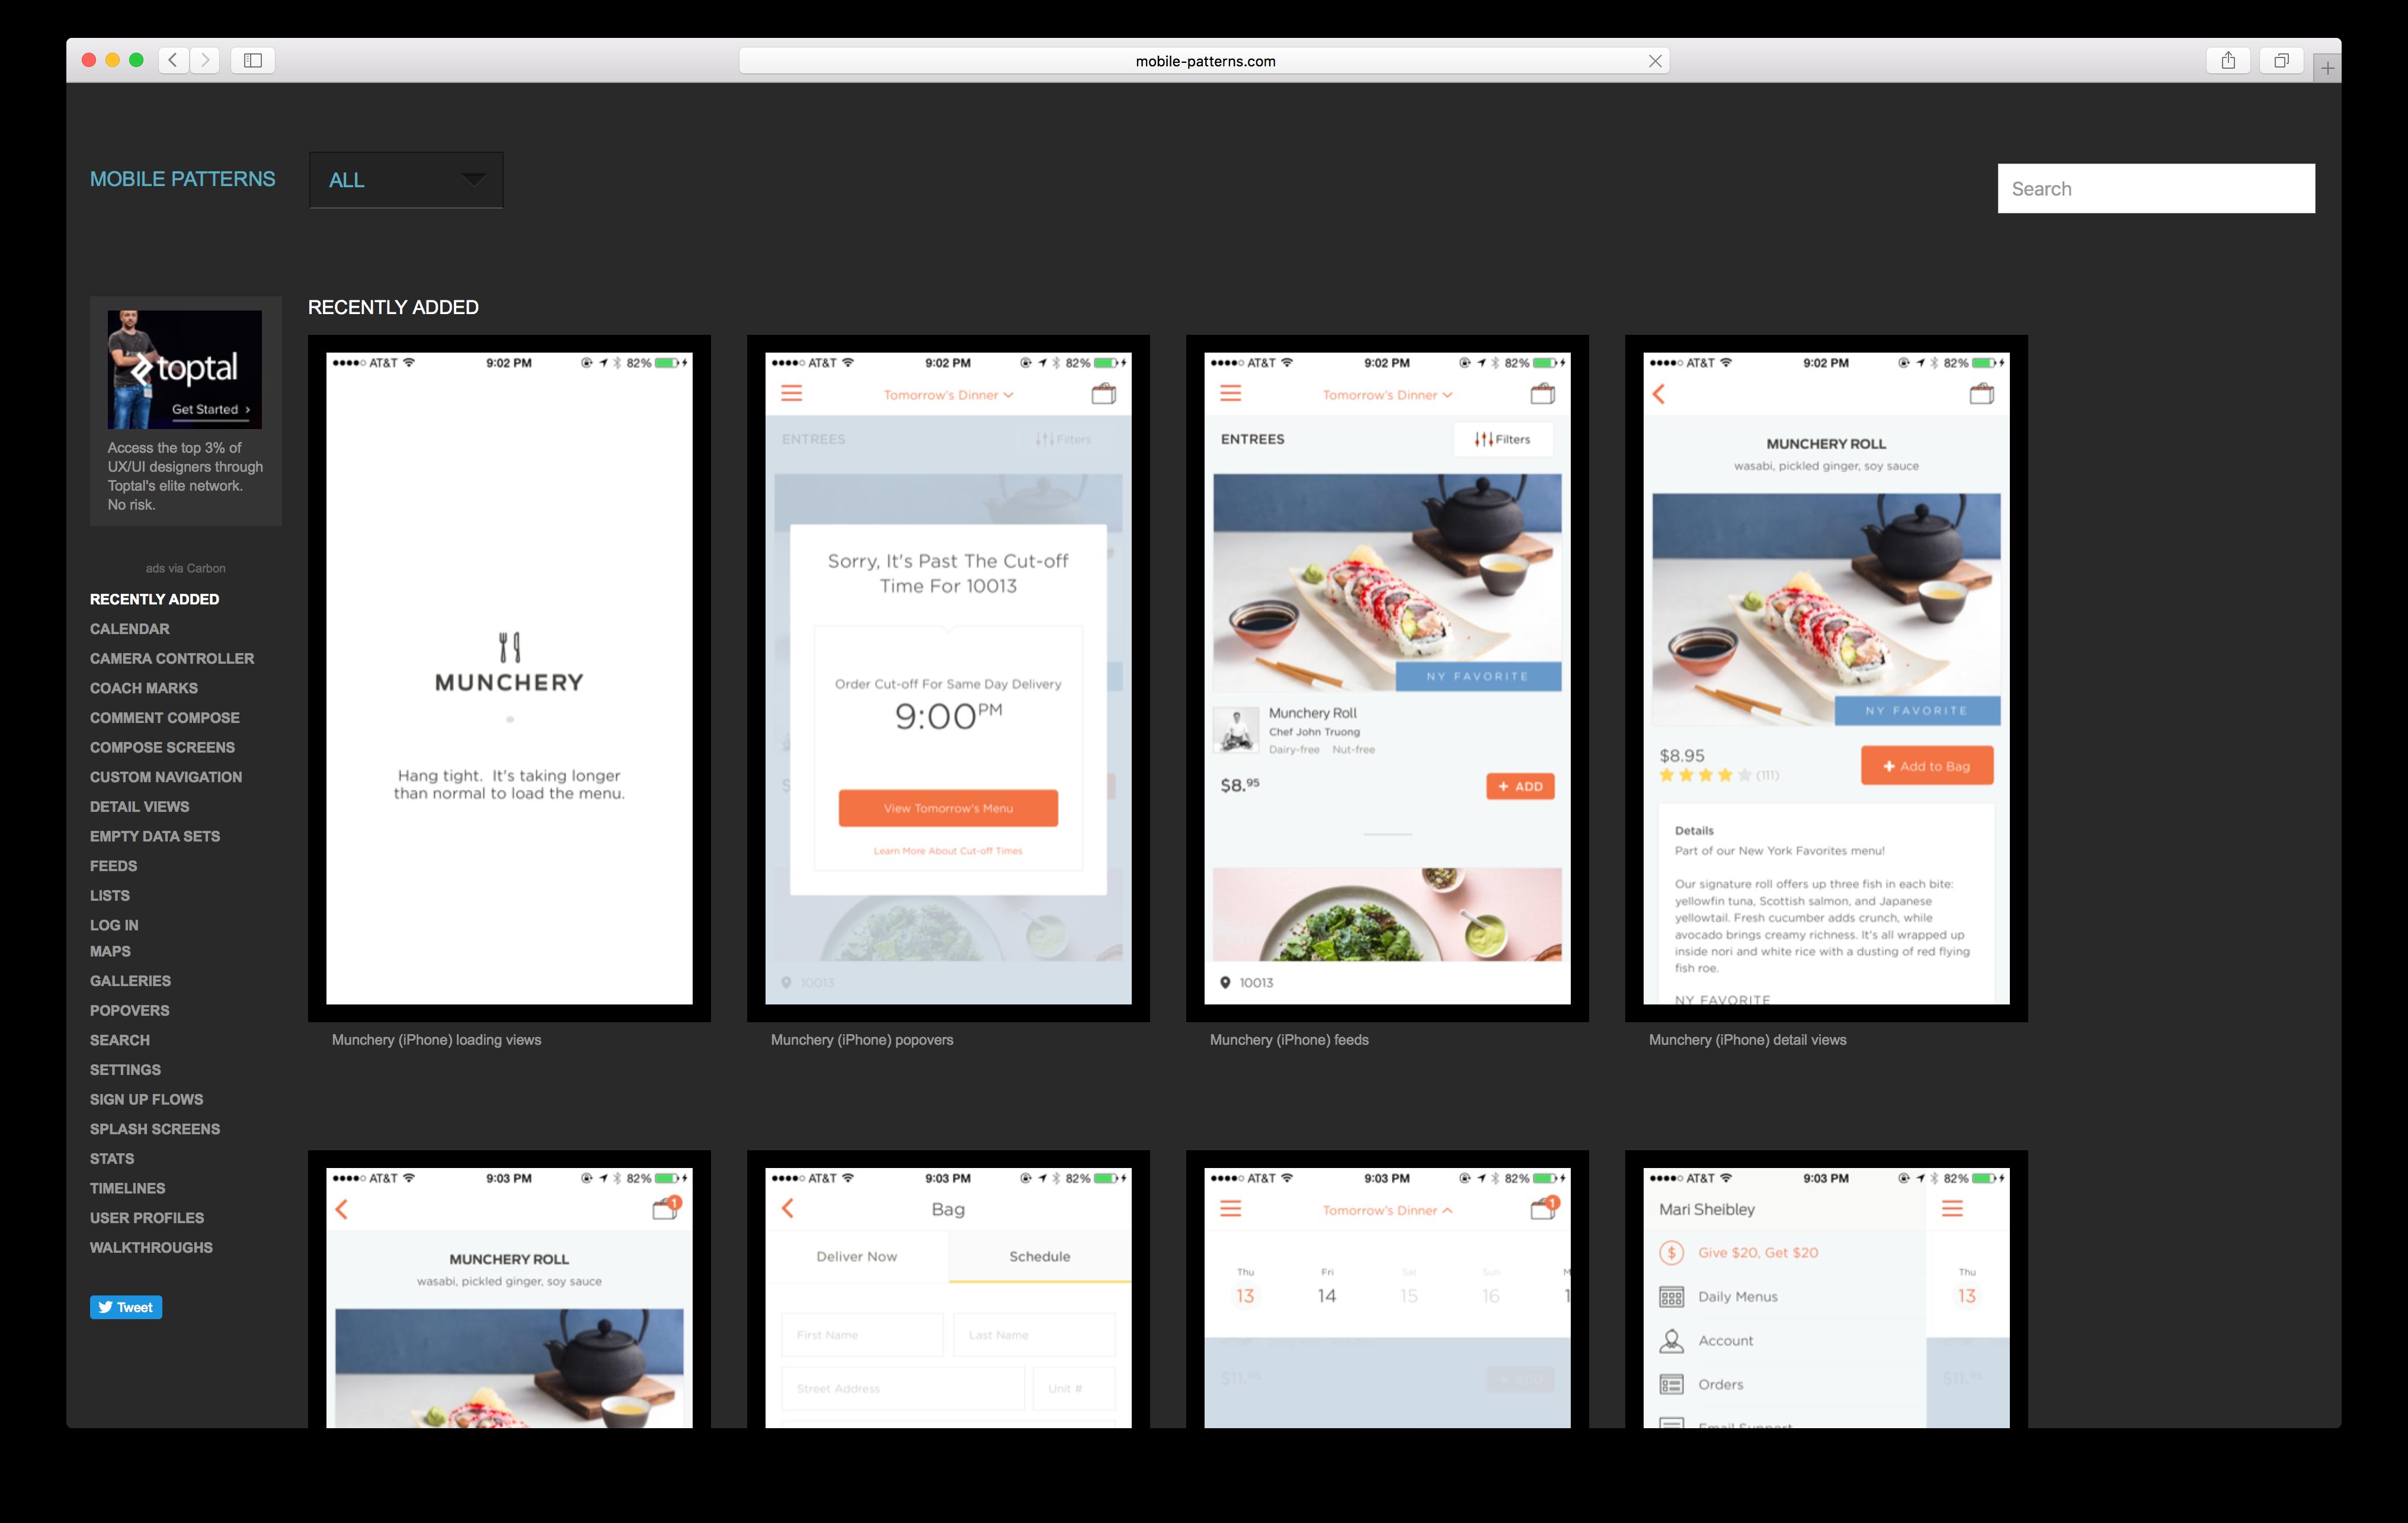 mobile-patterns.com